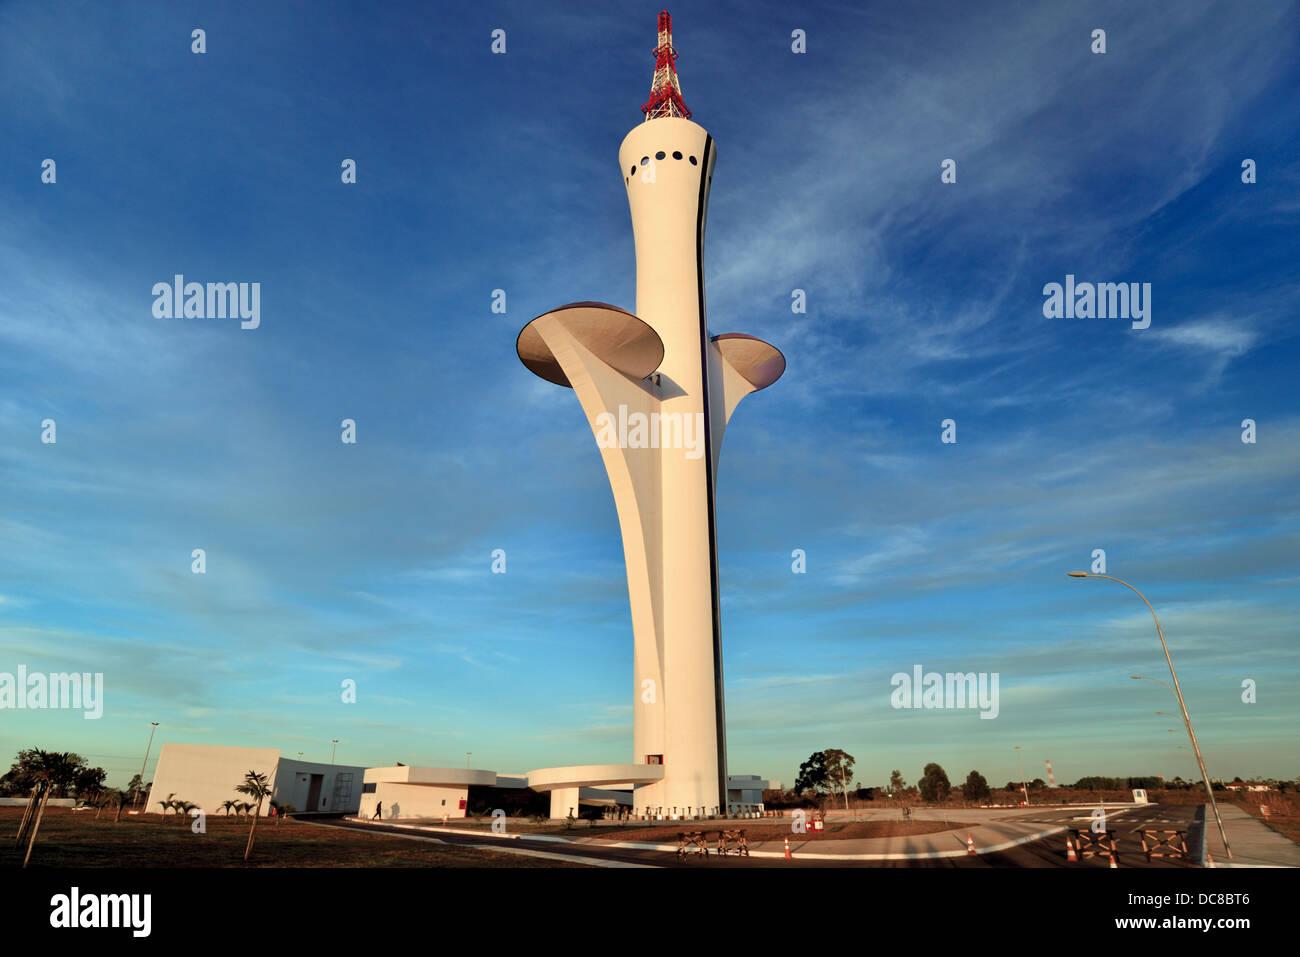 Brazil, Brasilia: Digital TV Tower designed by architect Oscar Niemeyer Stock Photo